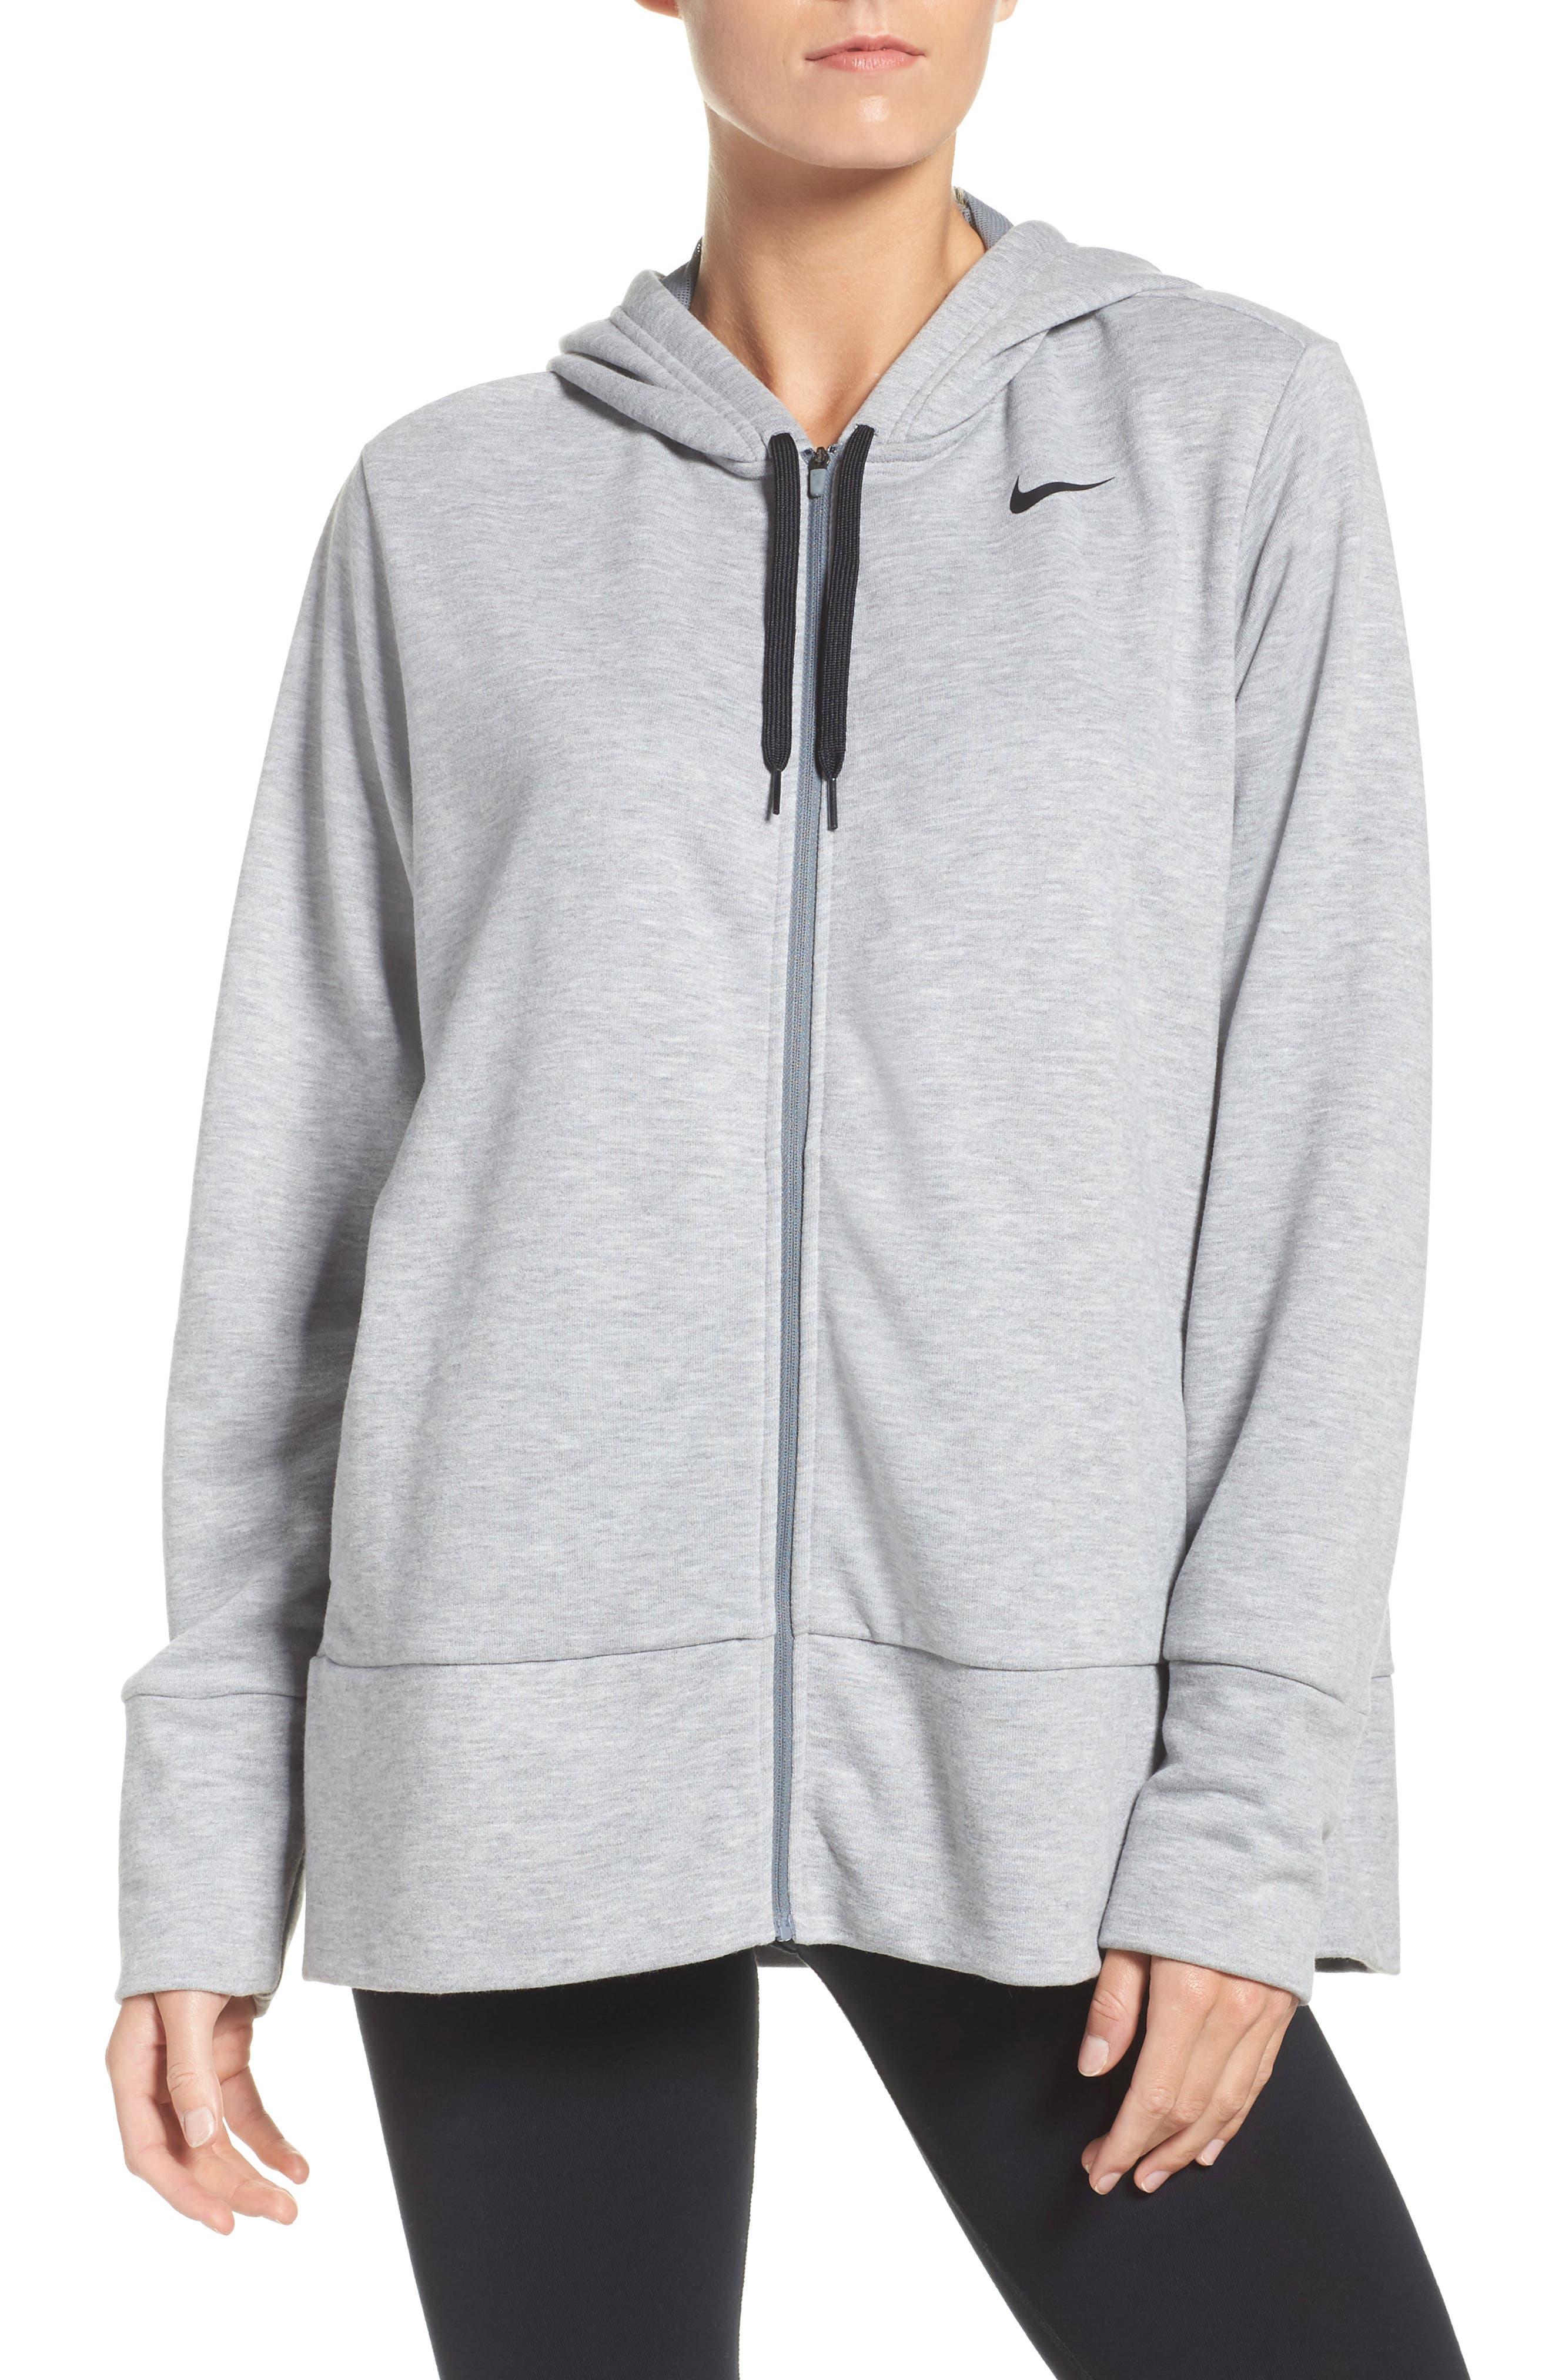 Nike Dry-FIT Oversize Zip Hoodie (Plus Size)